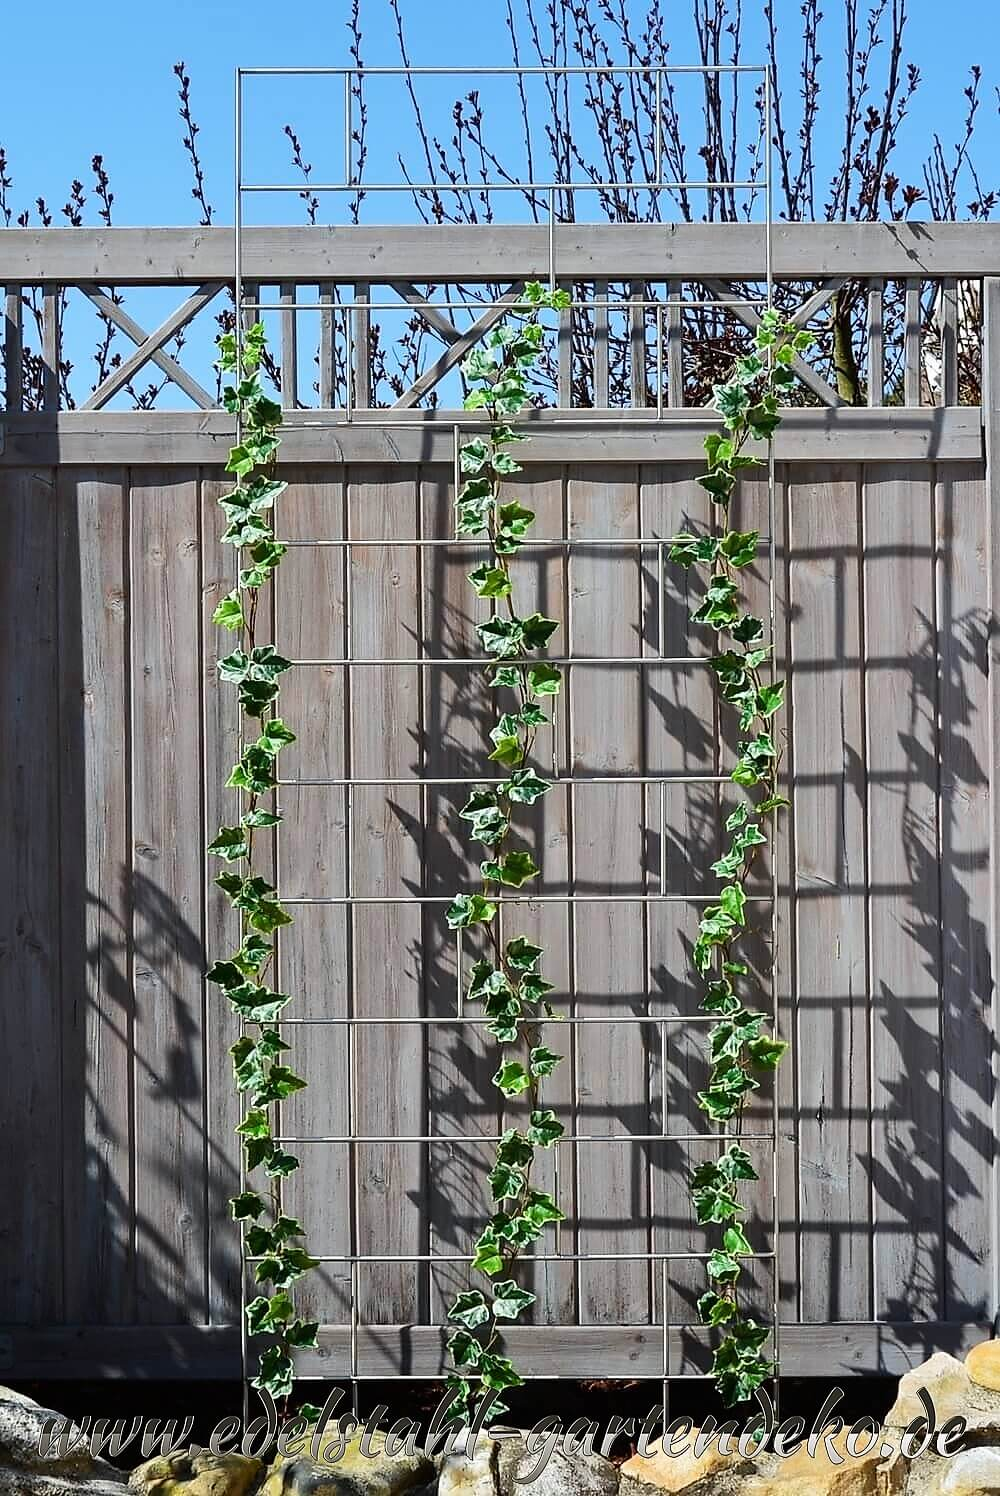 Rankgitter celina aus edelstahl ein wahrhaft stilvoller anblick - Gartendeko stahl ...